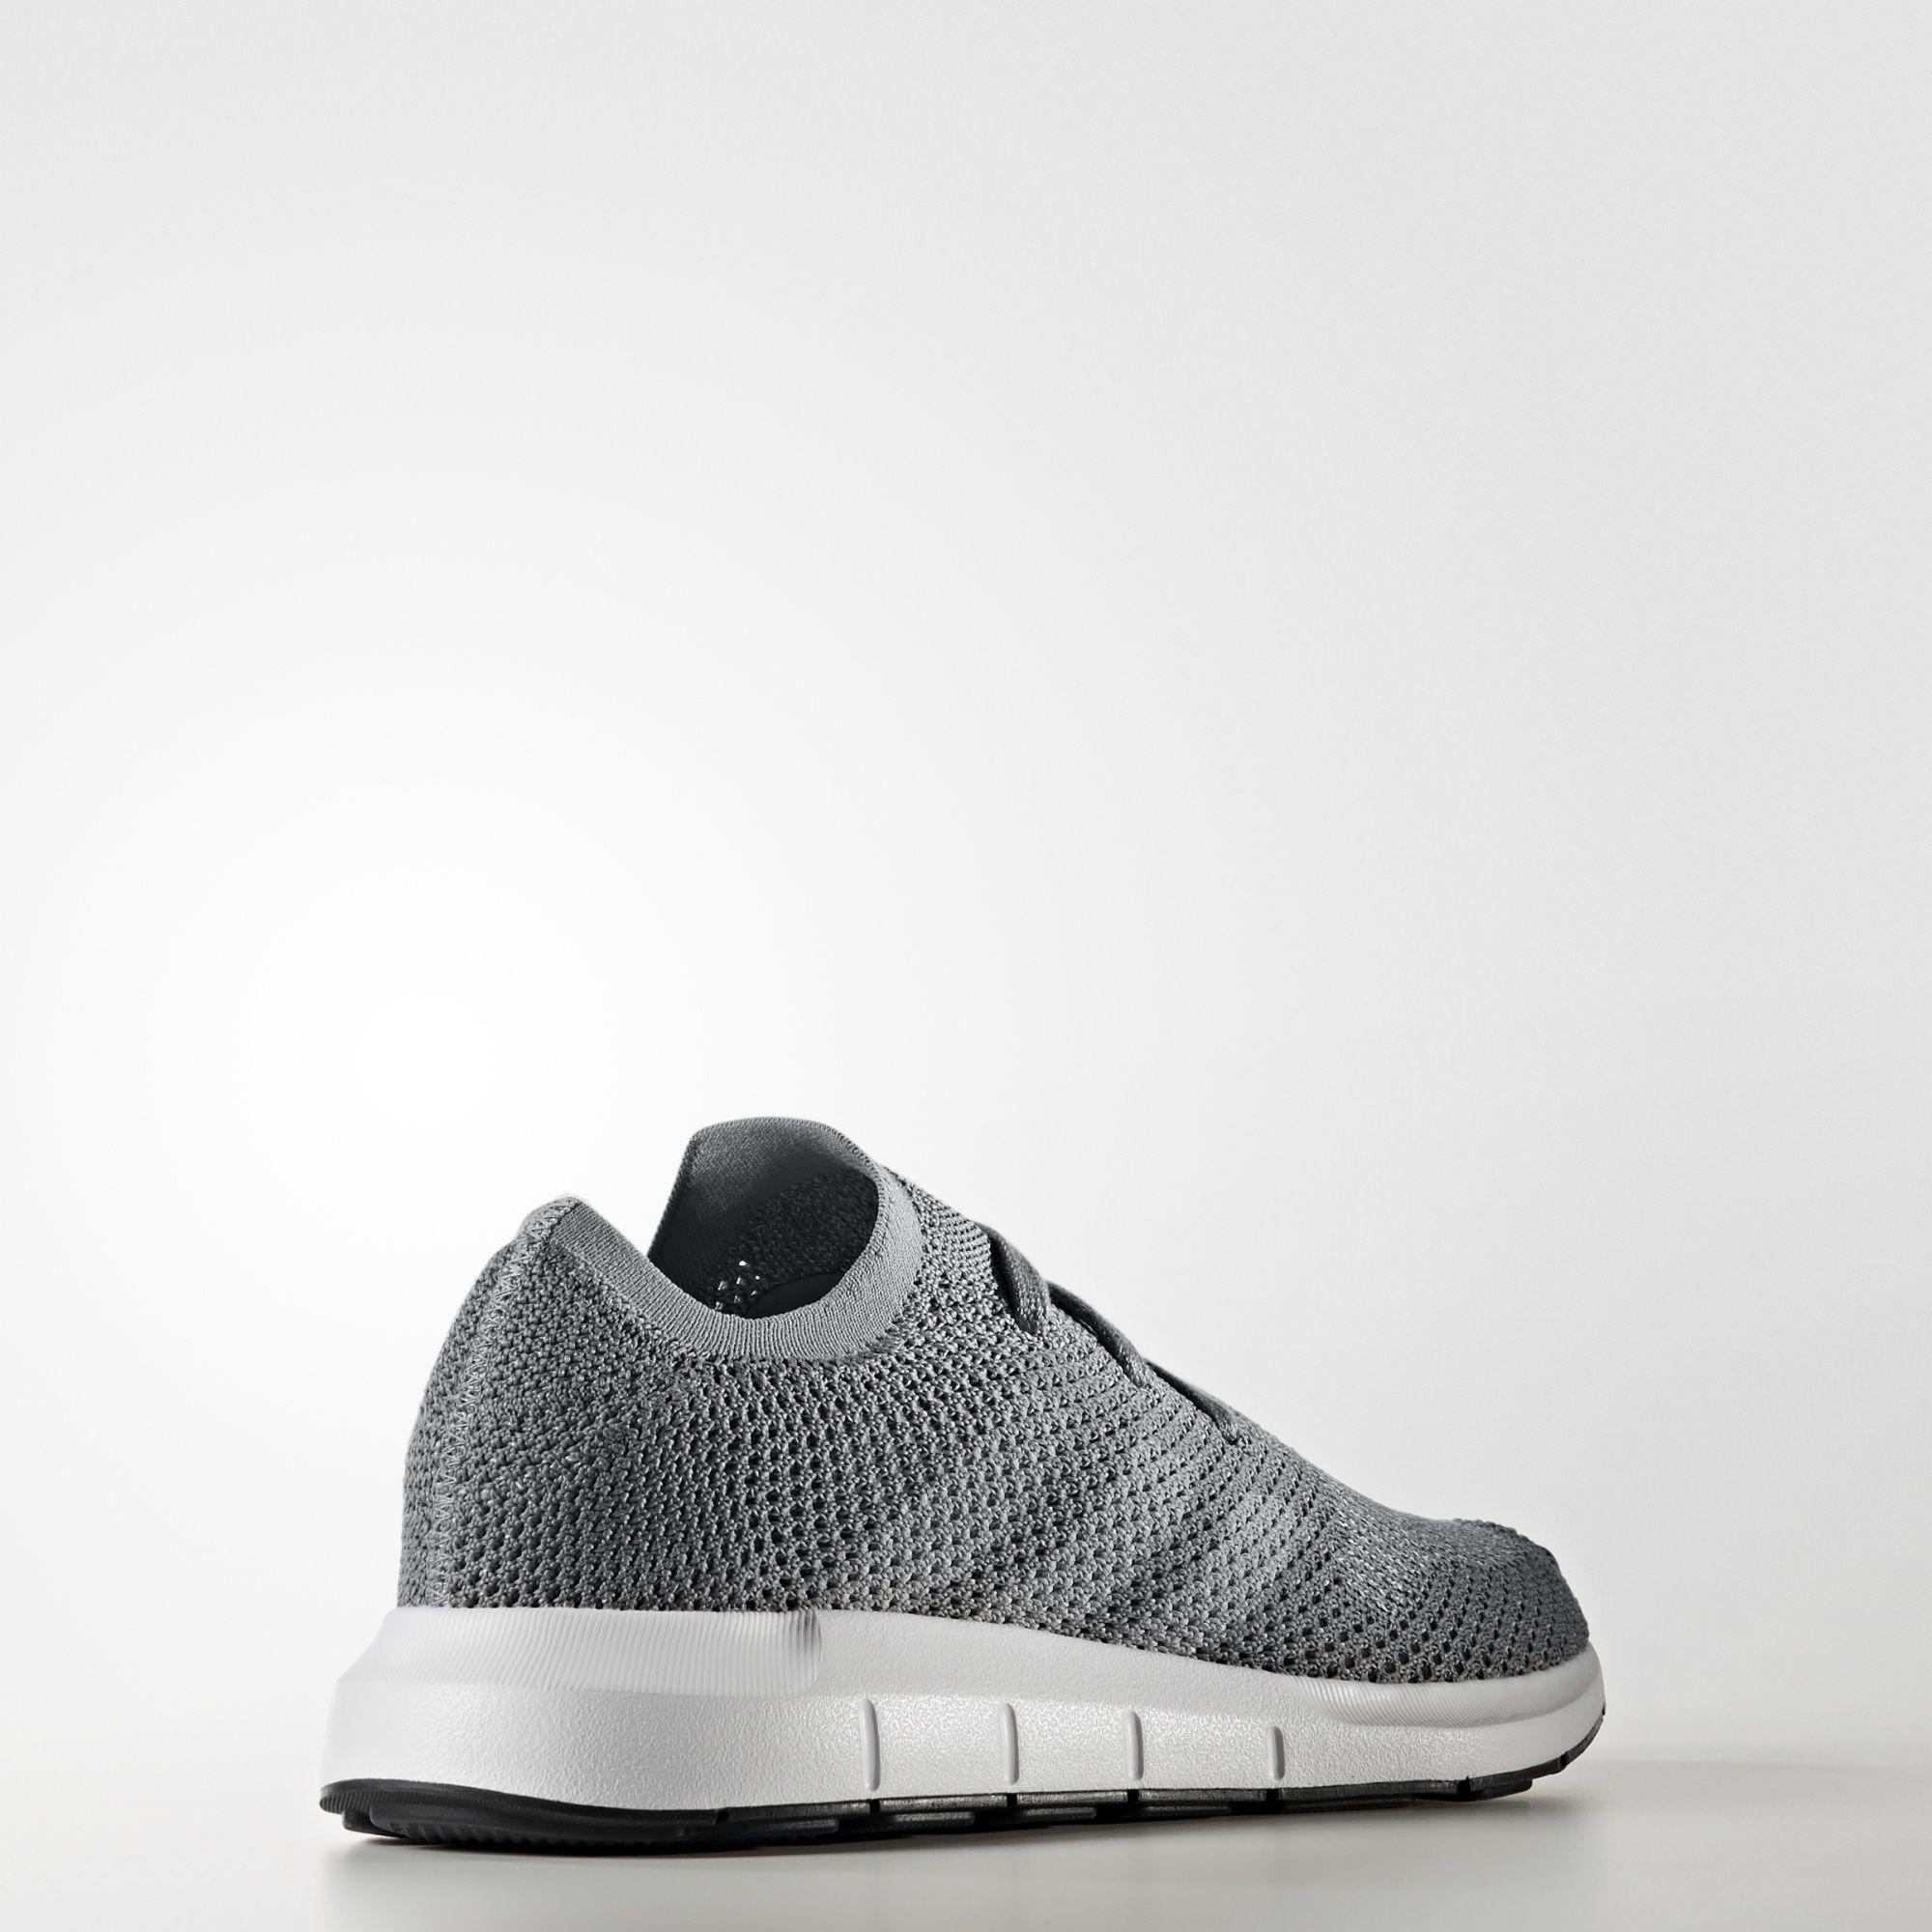 CG4128 adidas Swift Run Primeknit Grey 3